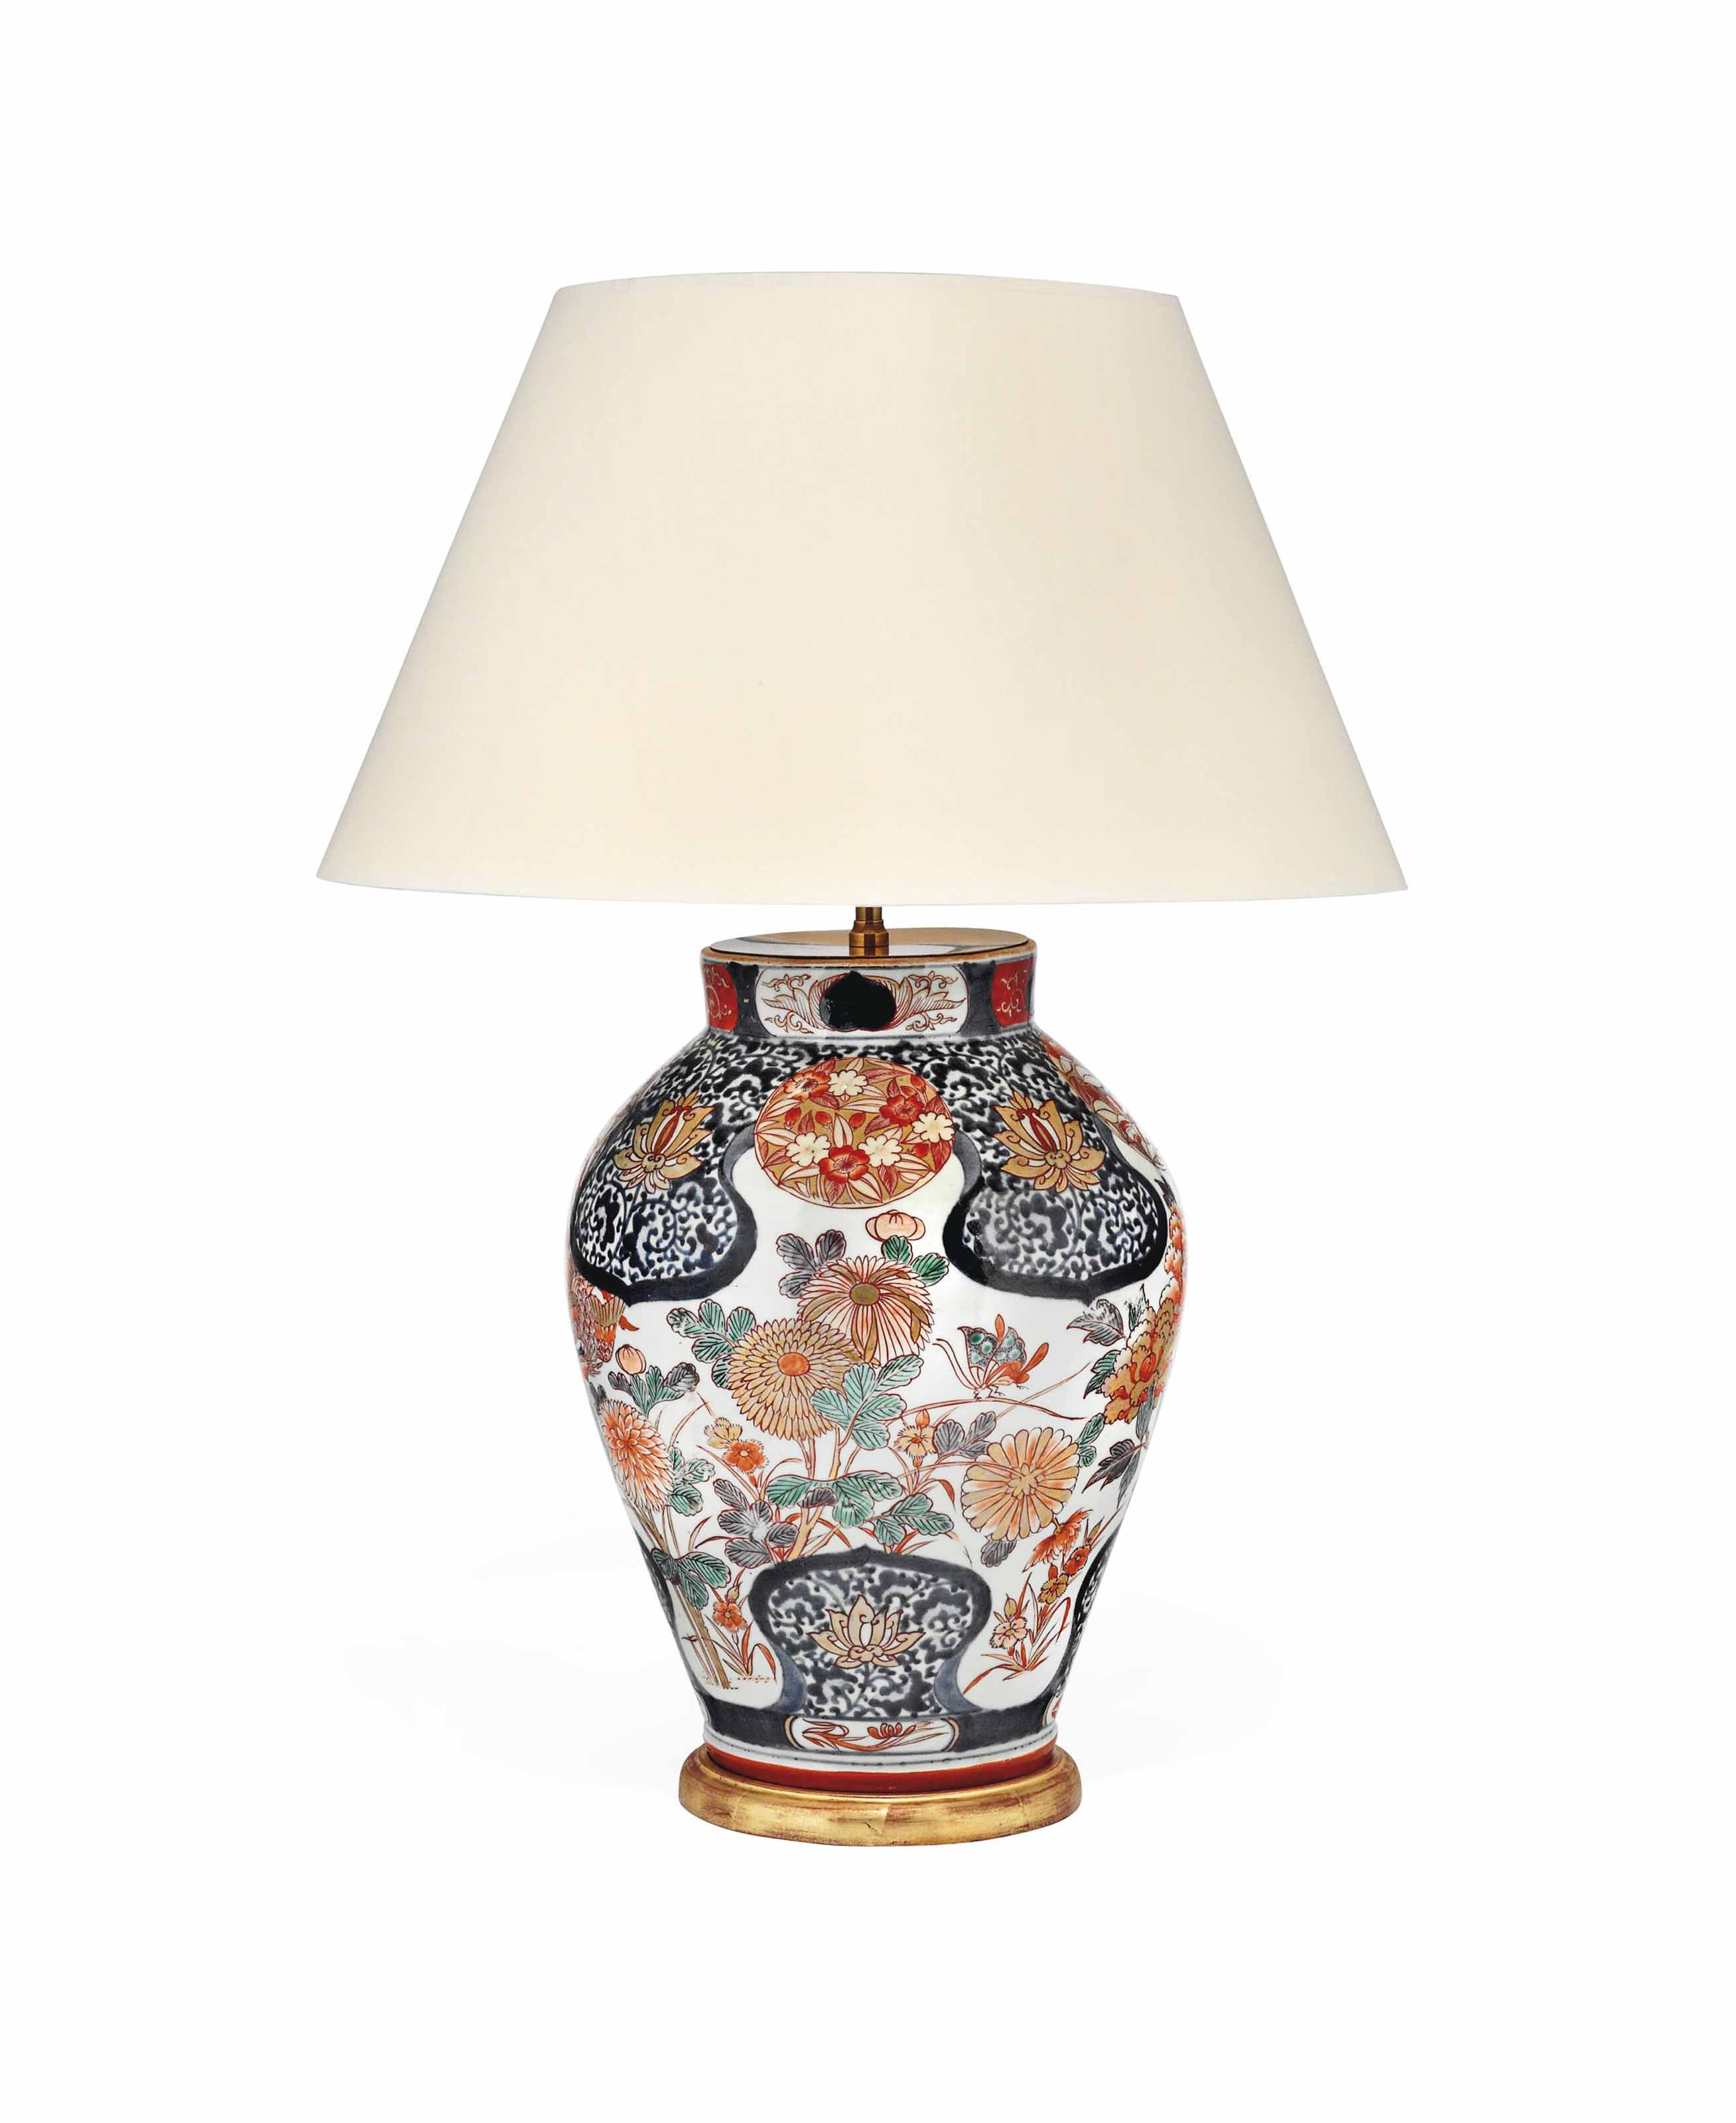 A JAPANESE IMARI VASE LAMP